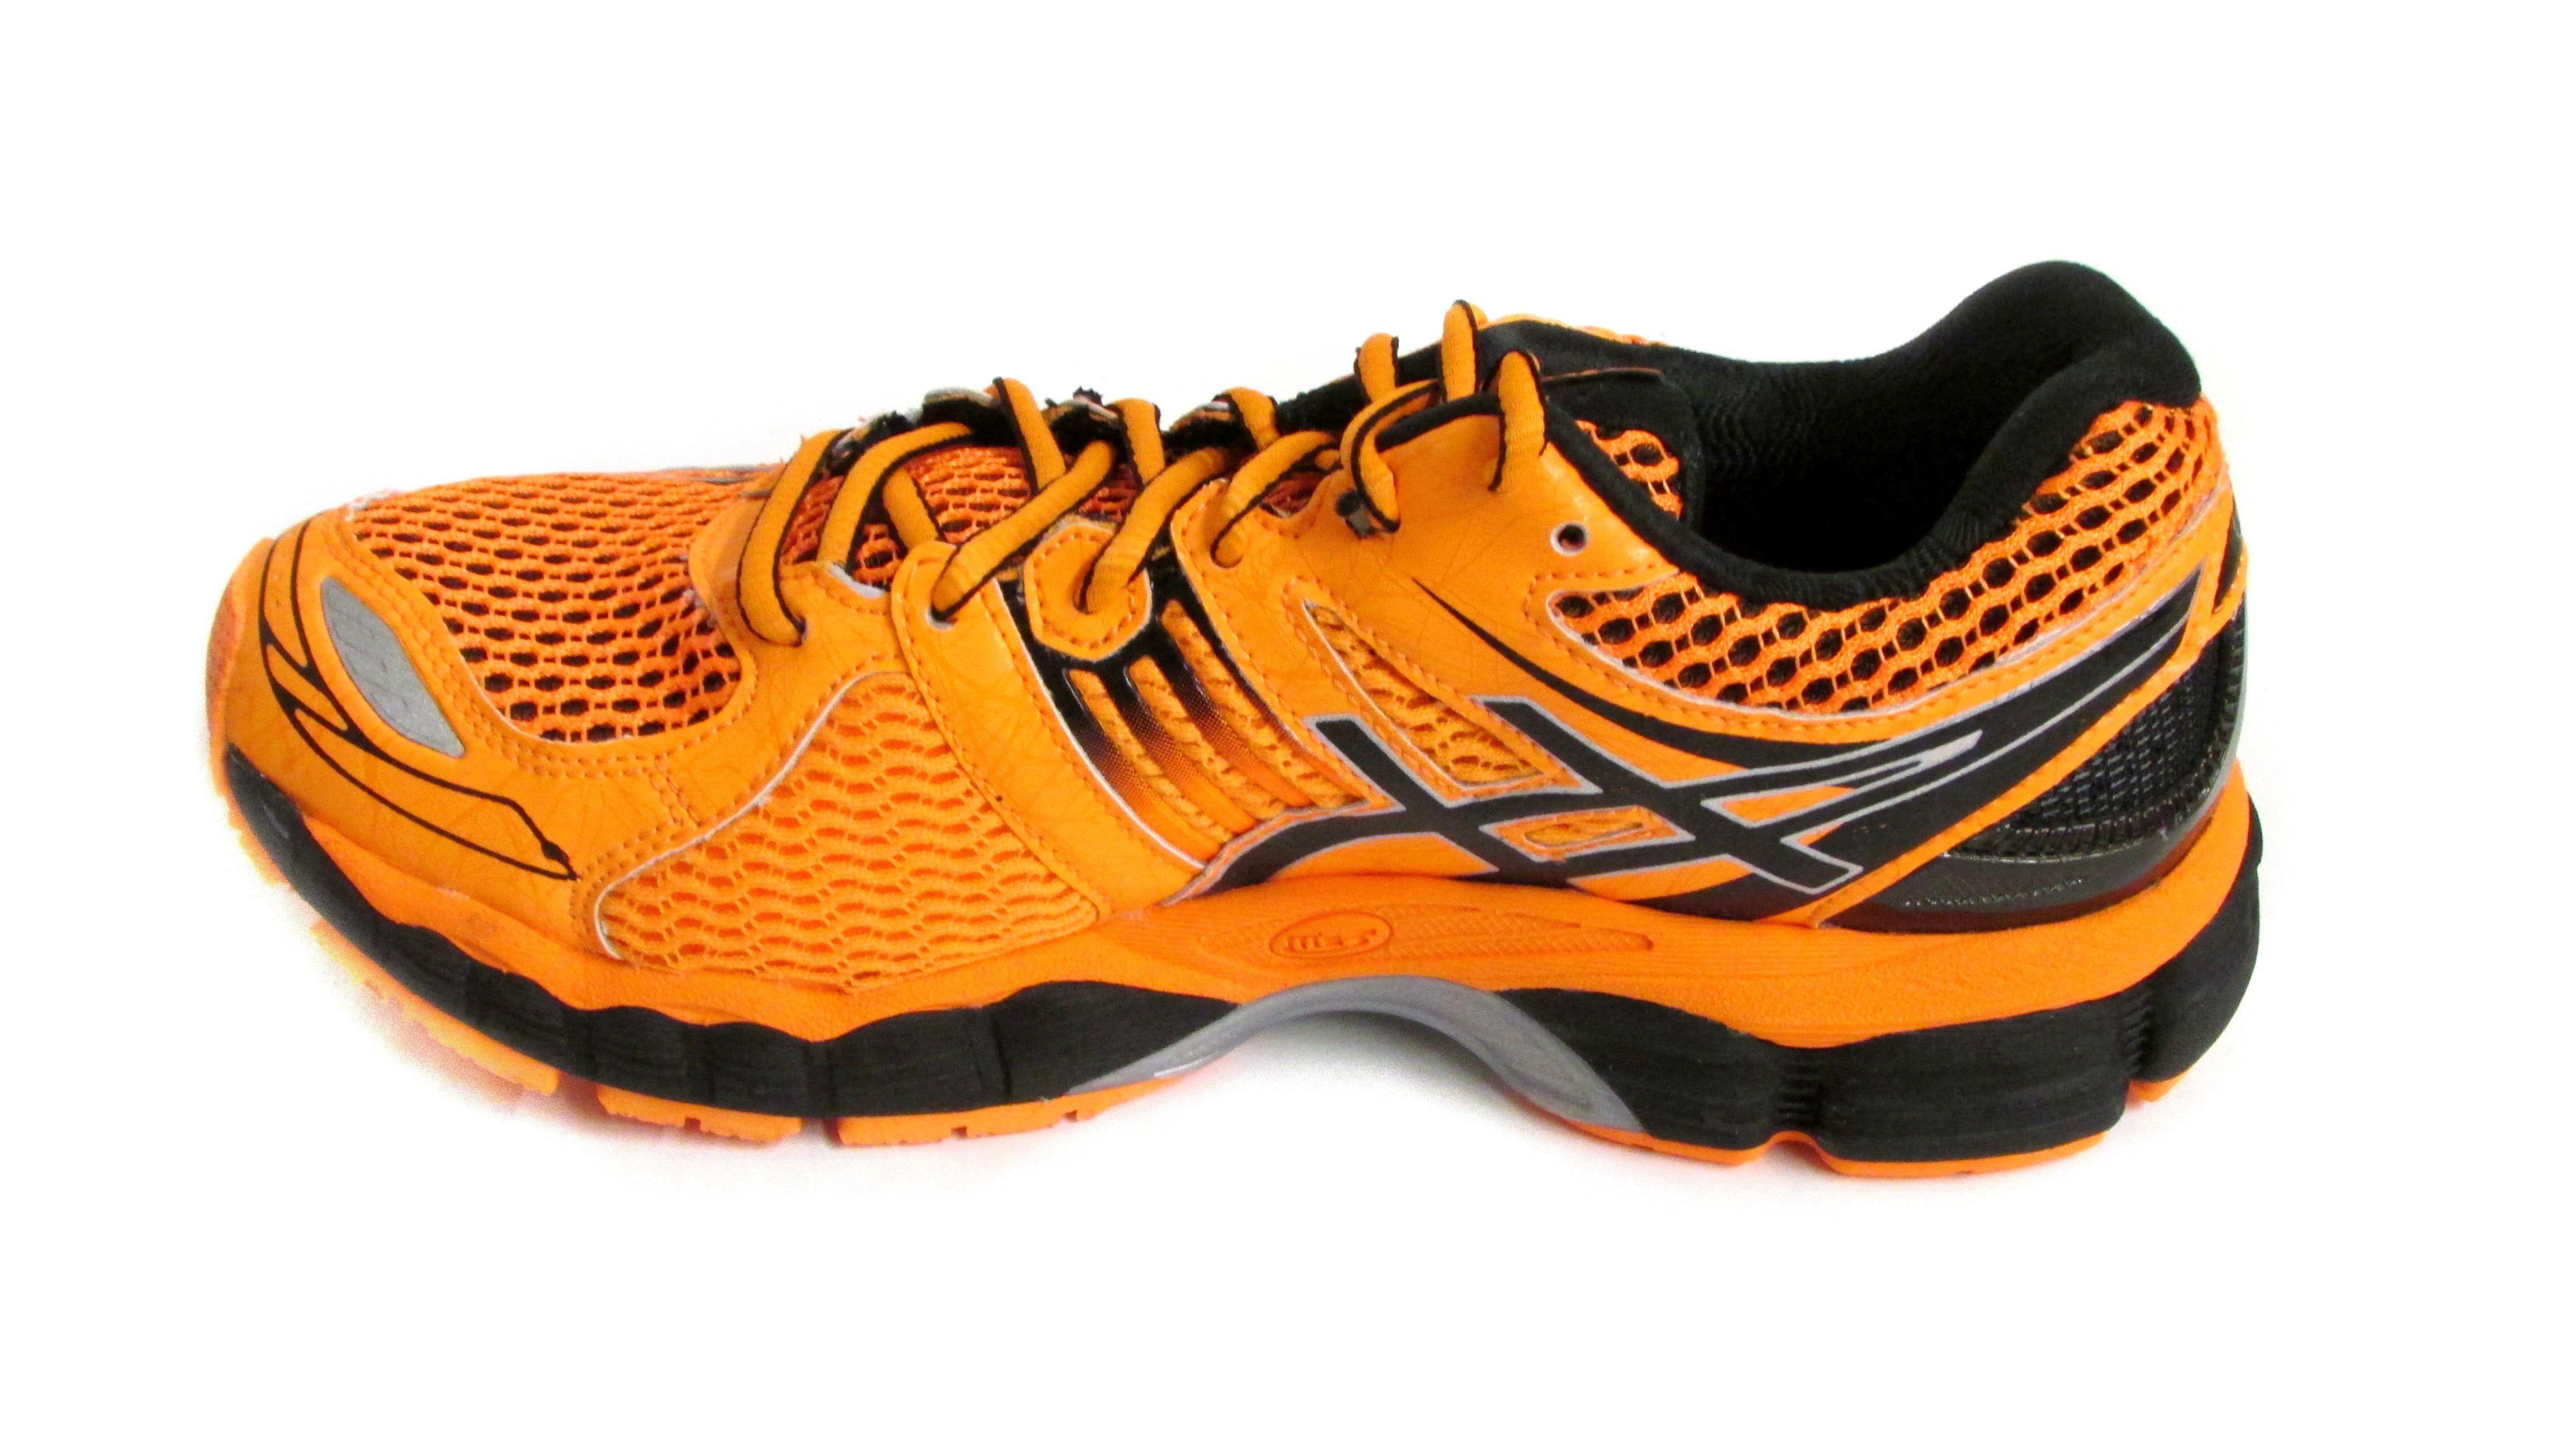 Asics Menu0026#39;s Gel Nimbus 15 Running Shoes US Sizes | EBay